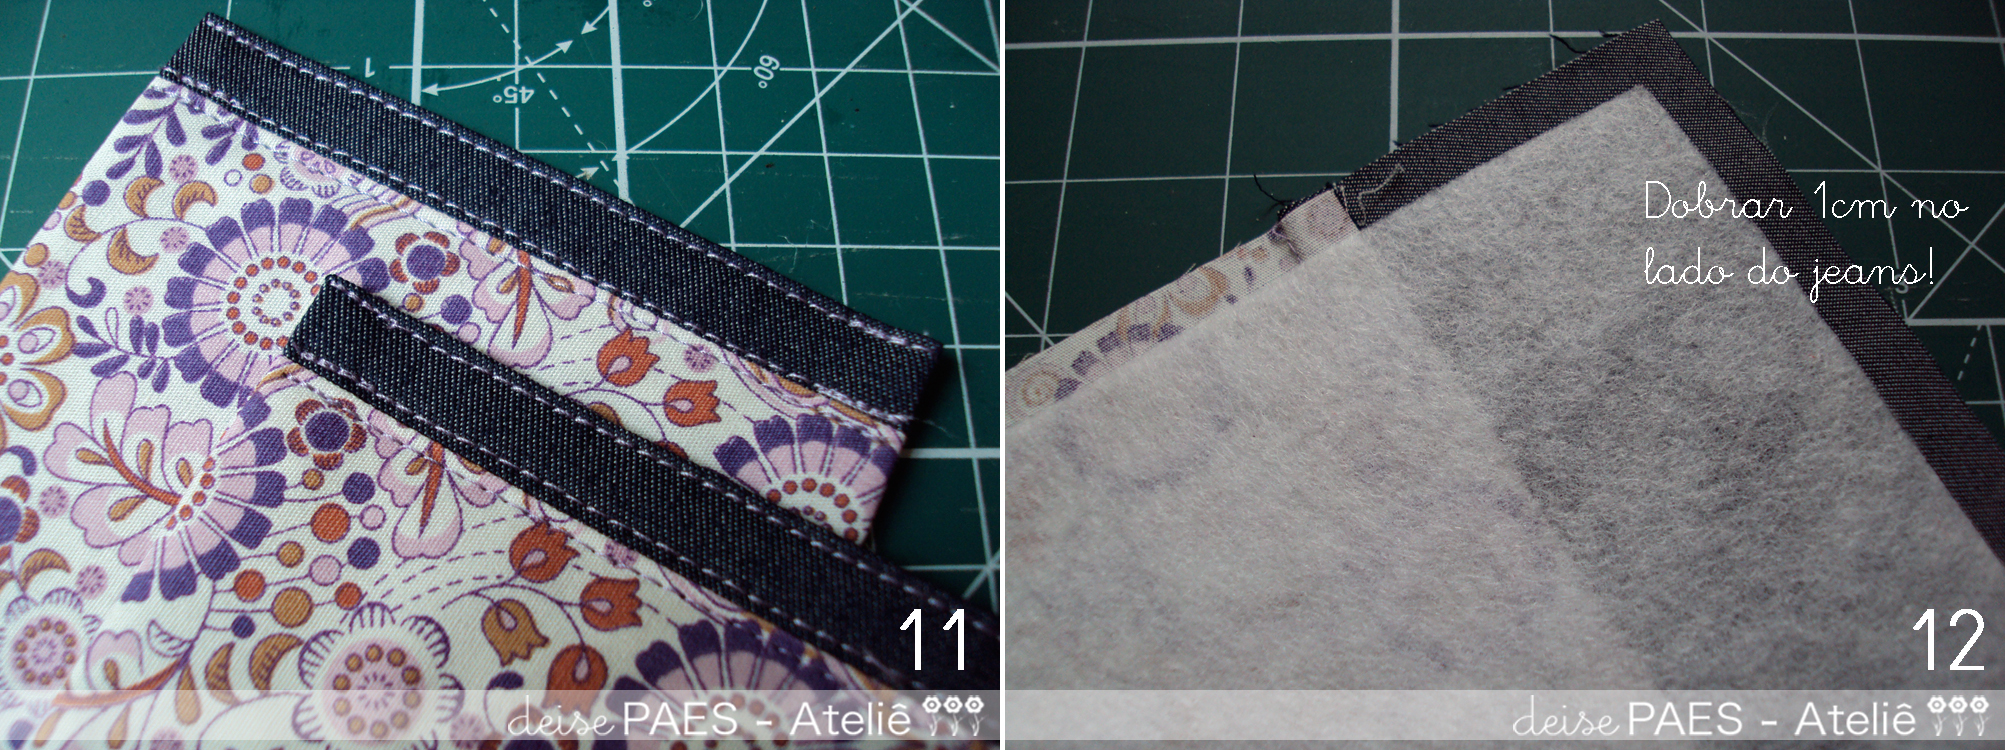 porta-absorventes - 06